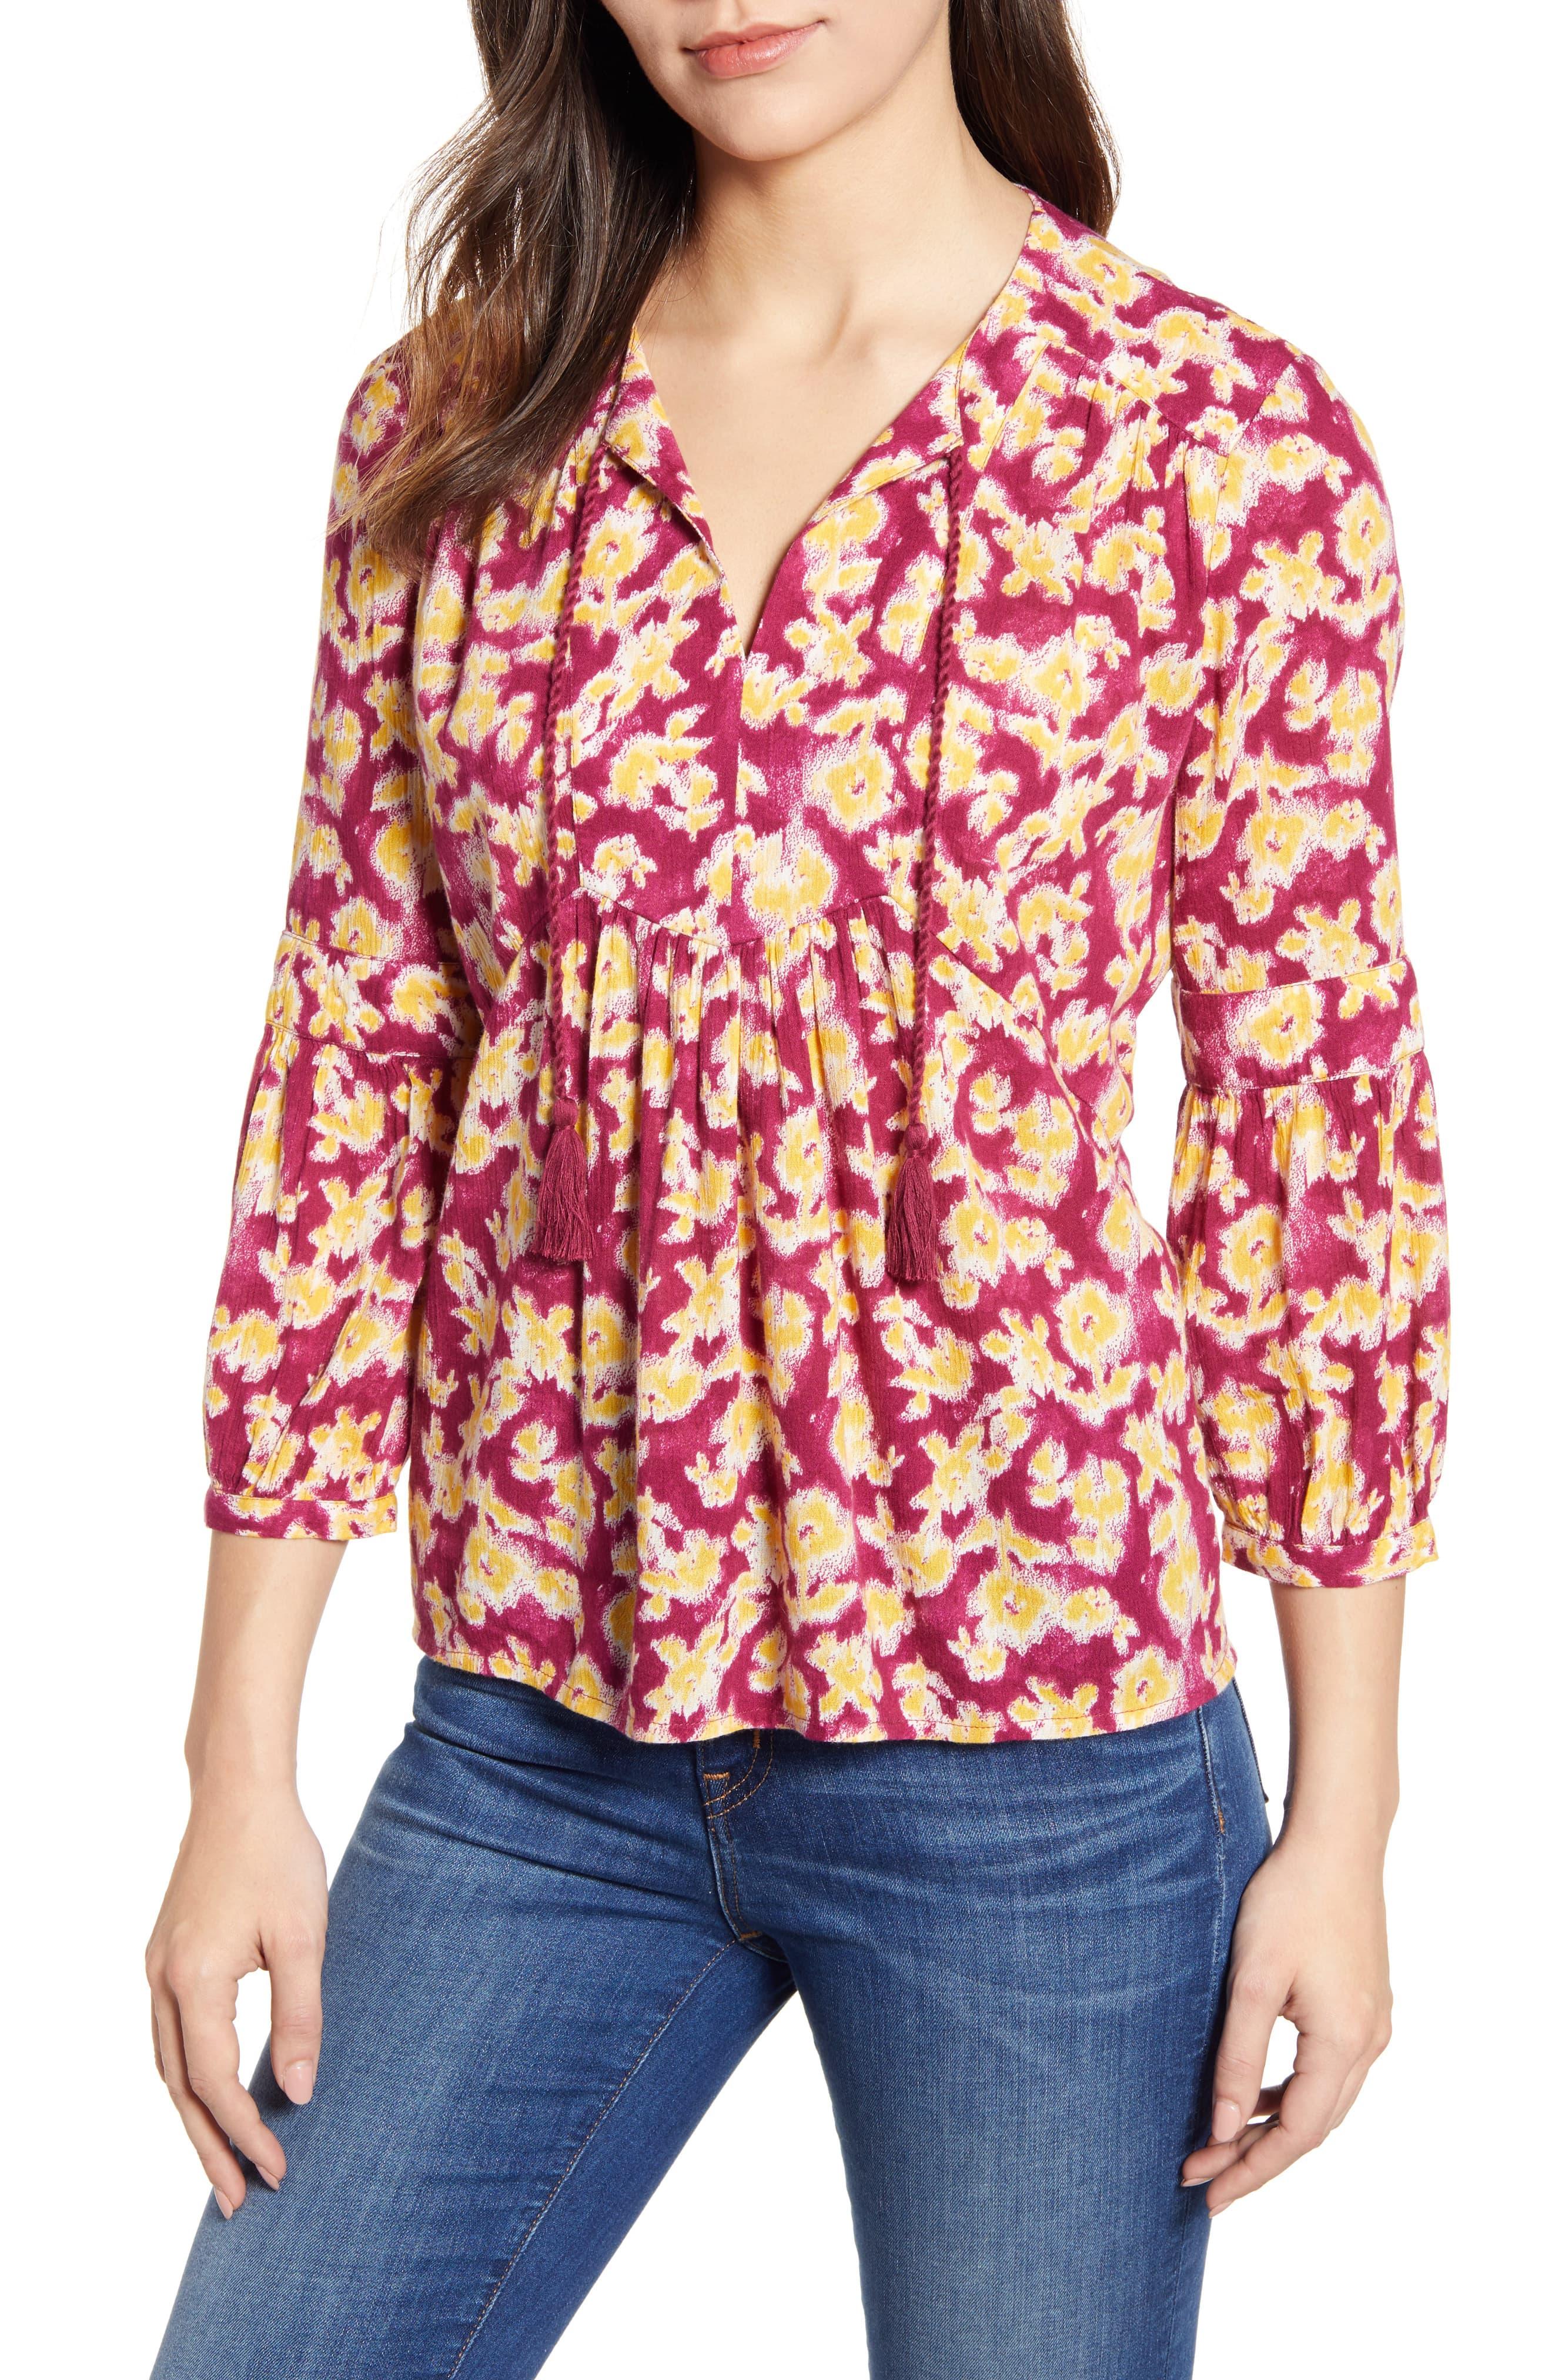 drawn-plus-size-petite-blouses